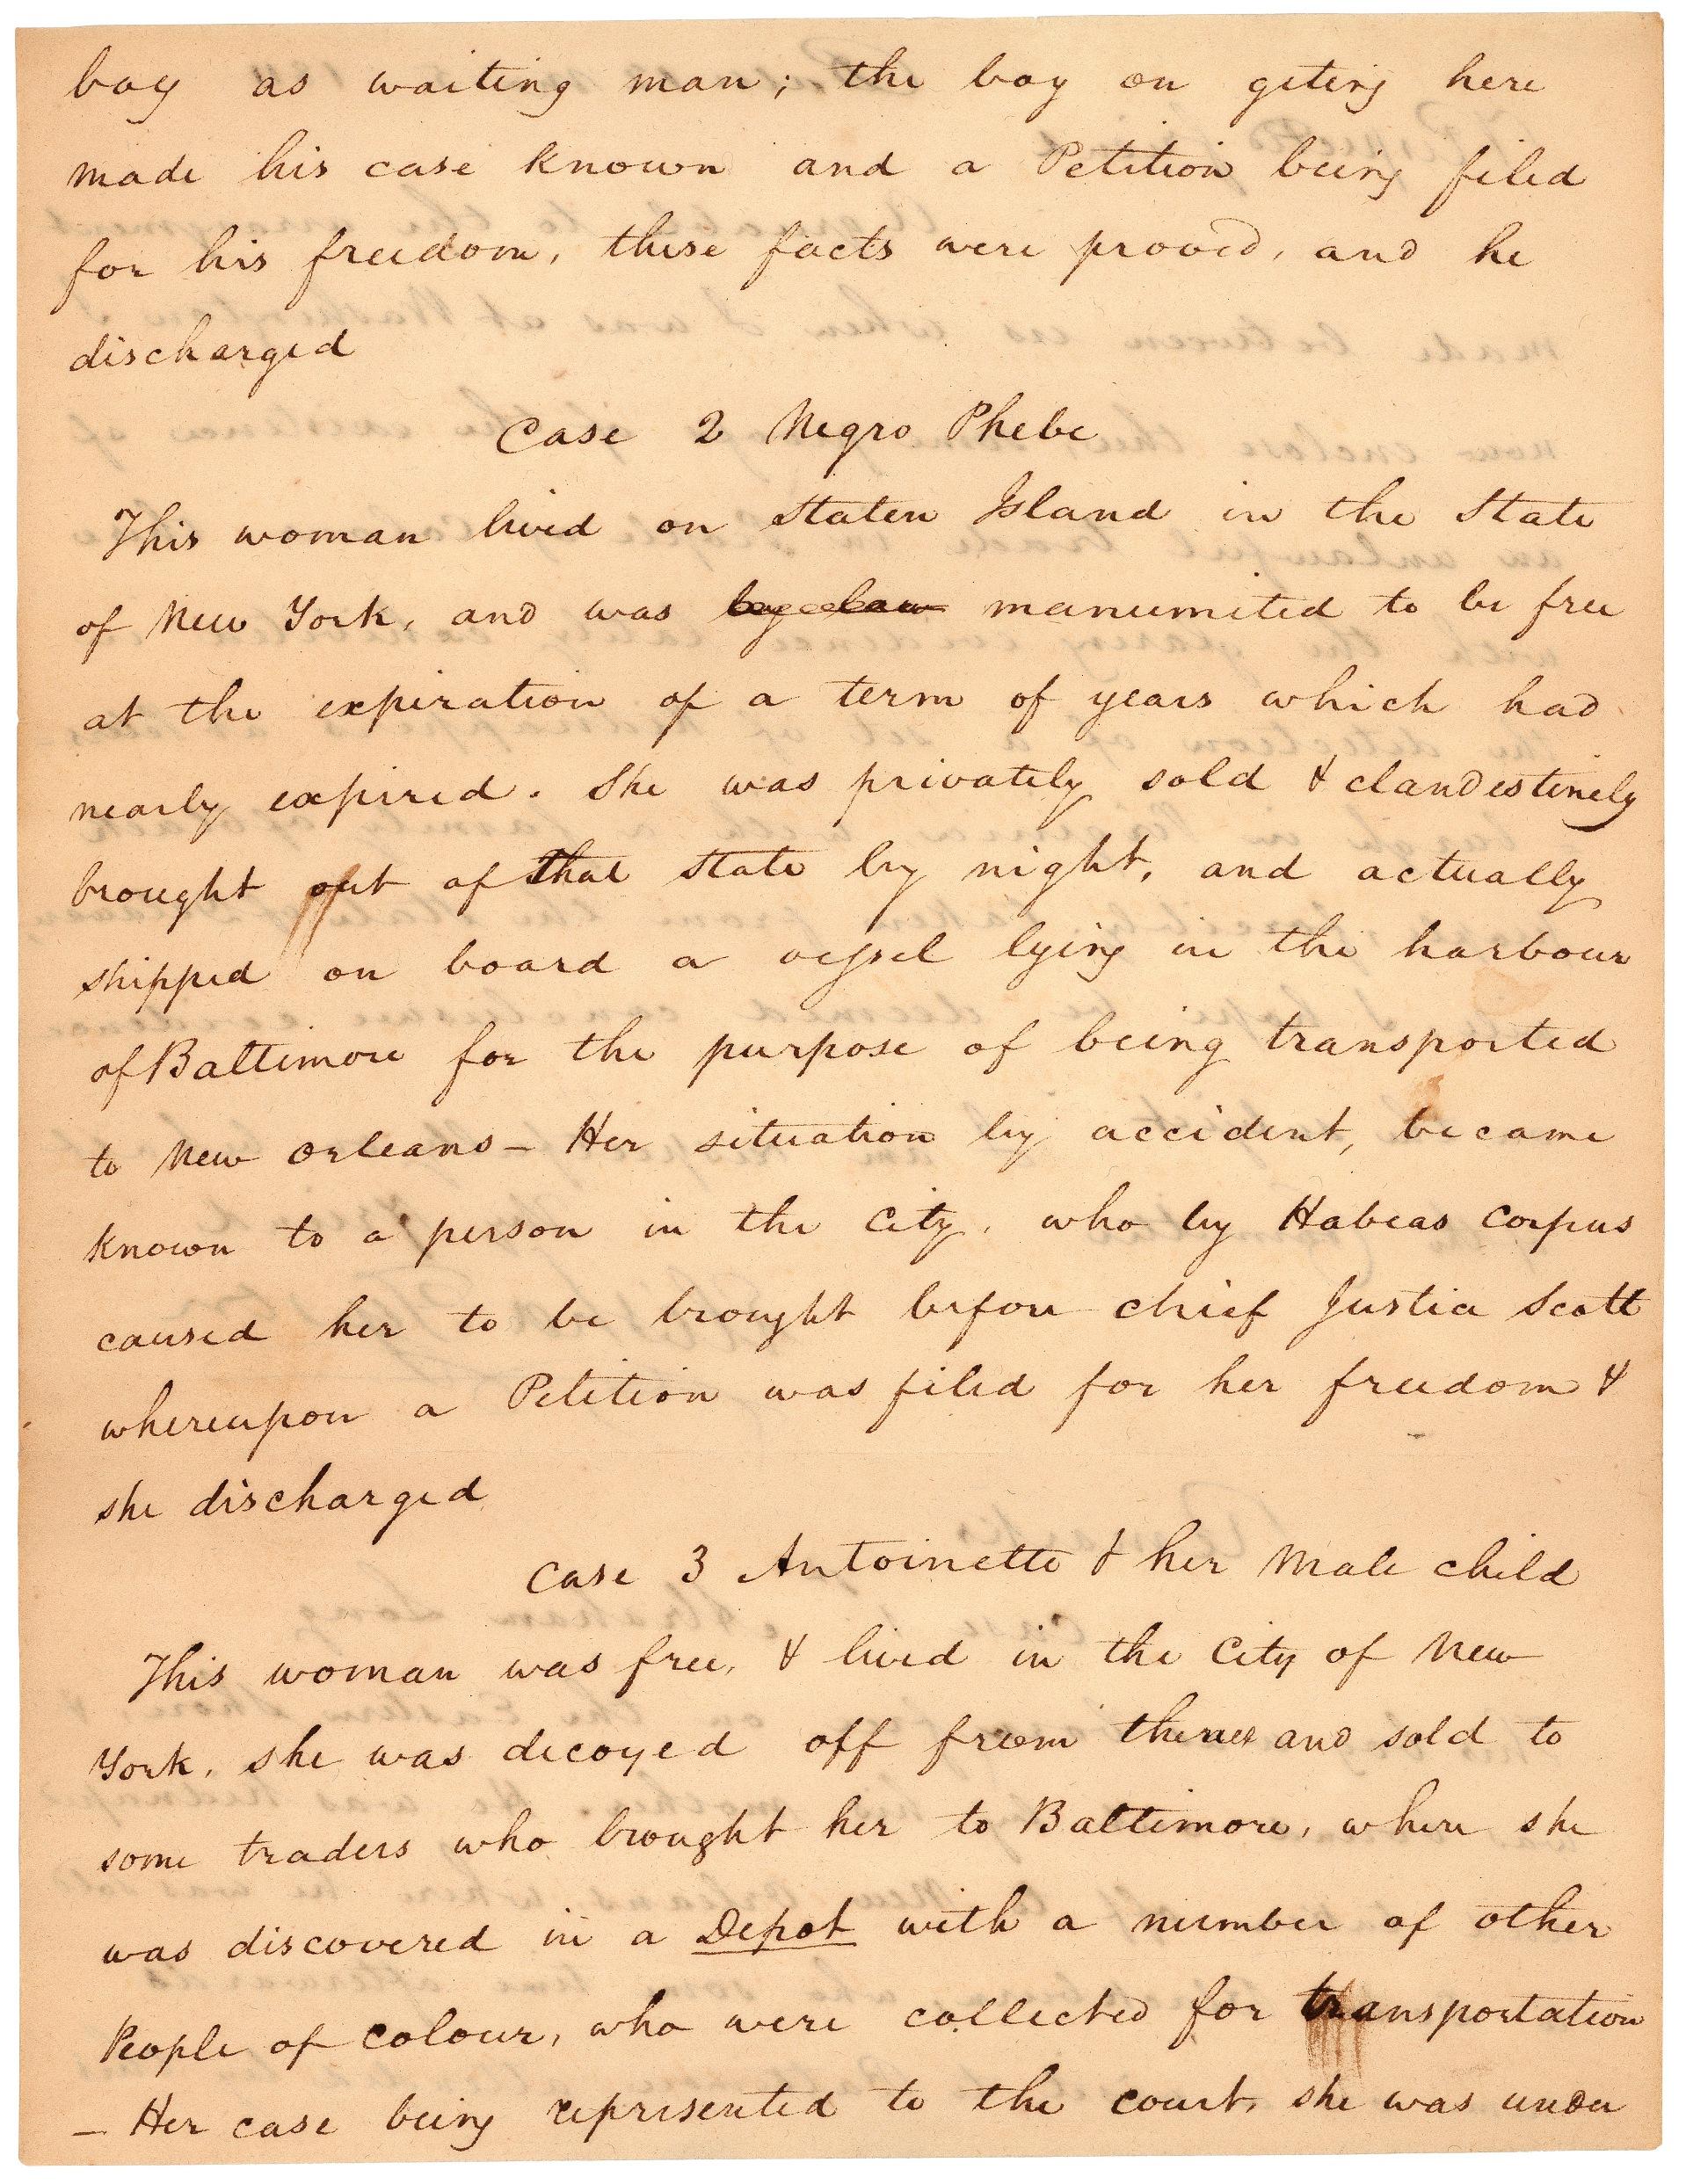 Letter from Elisha Tyson regarding kidnapped free blacks, December 5, 1811, page 2.